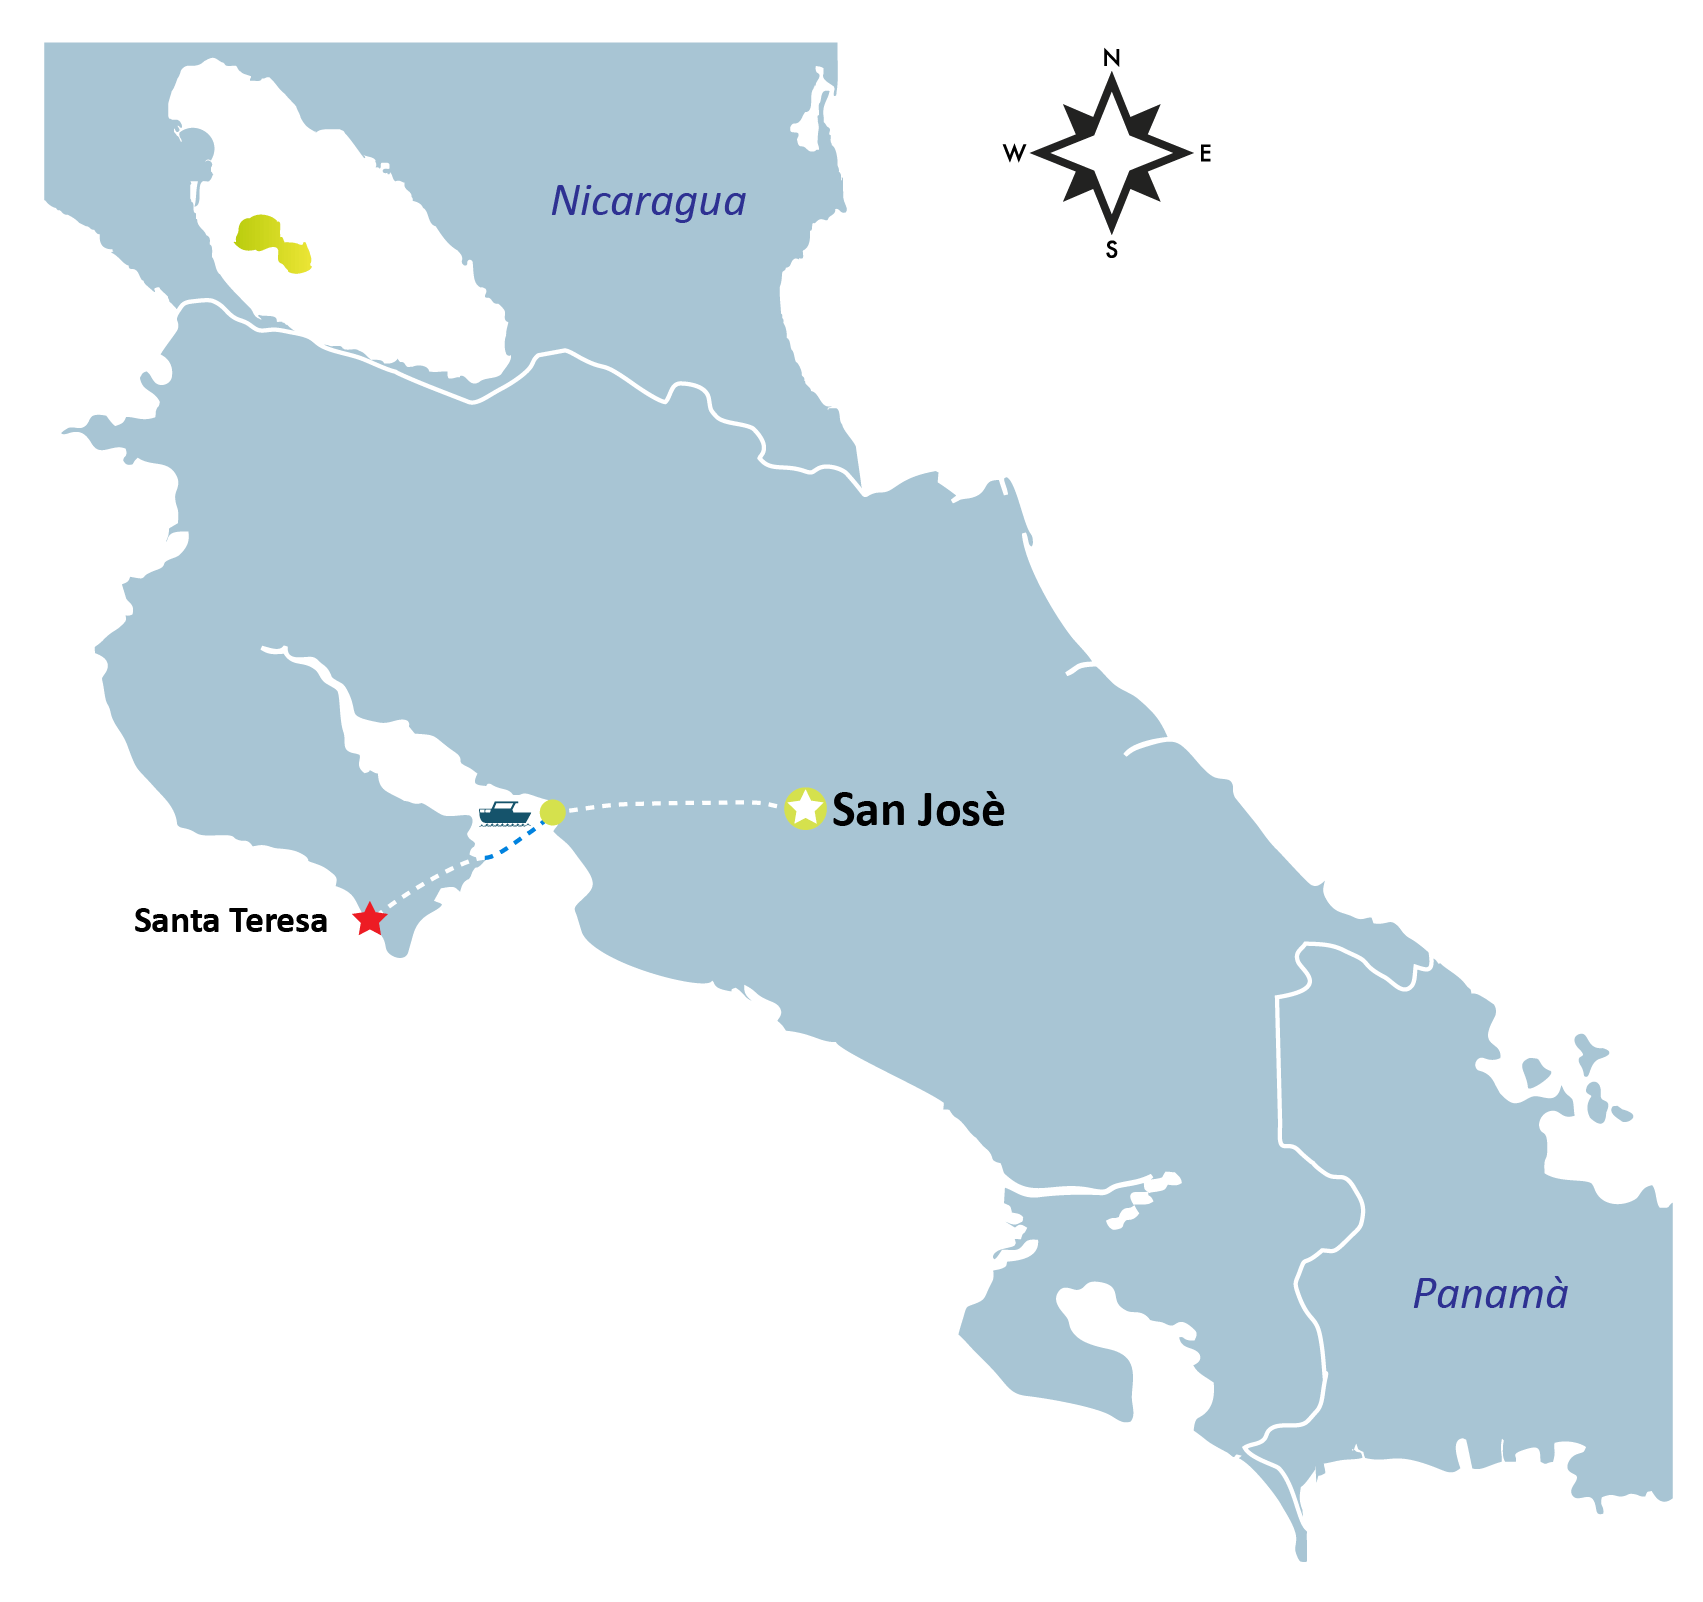 Santa Teresa Map - SANTA TERESA